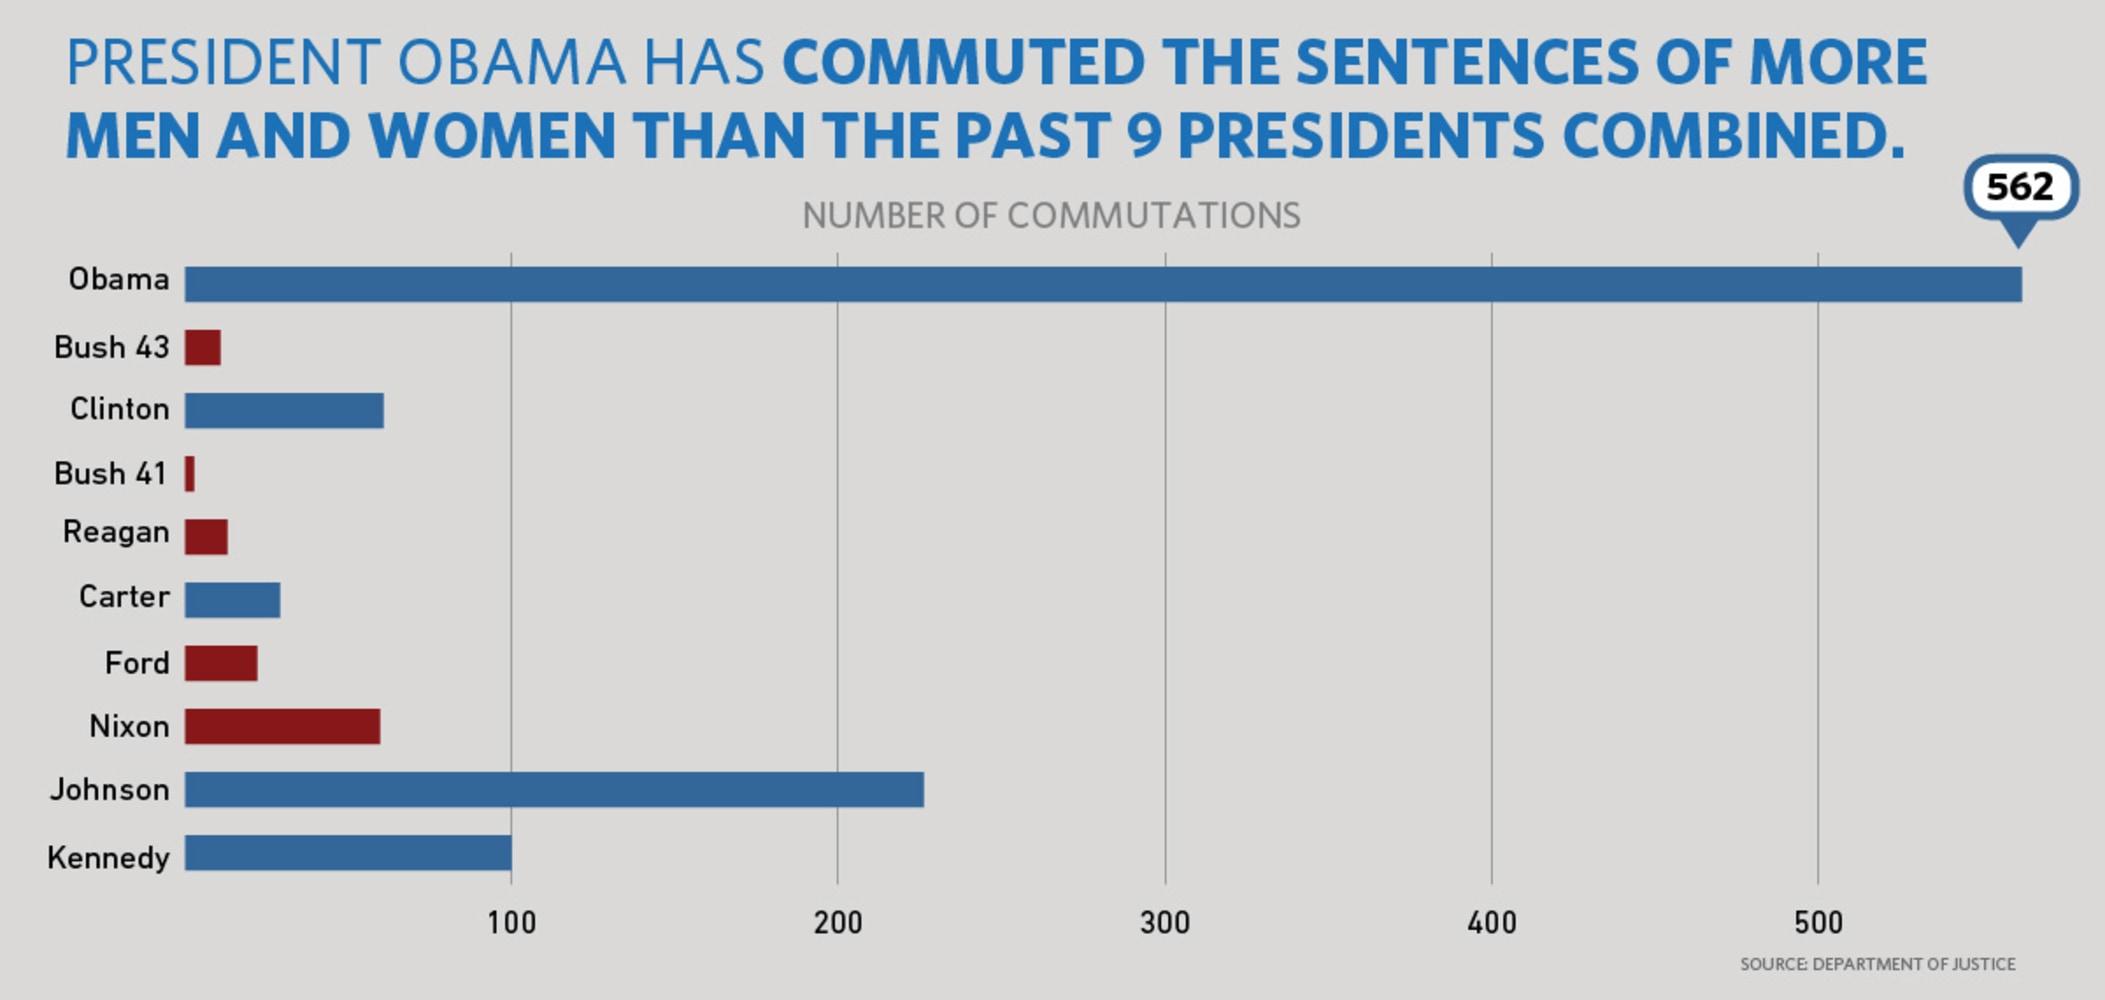 Obama Commutes Sentences for Over 200 Inmates in Unprecedented Move